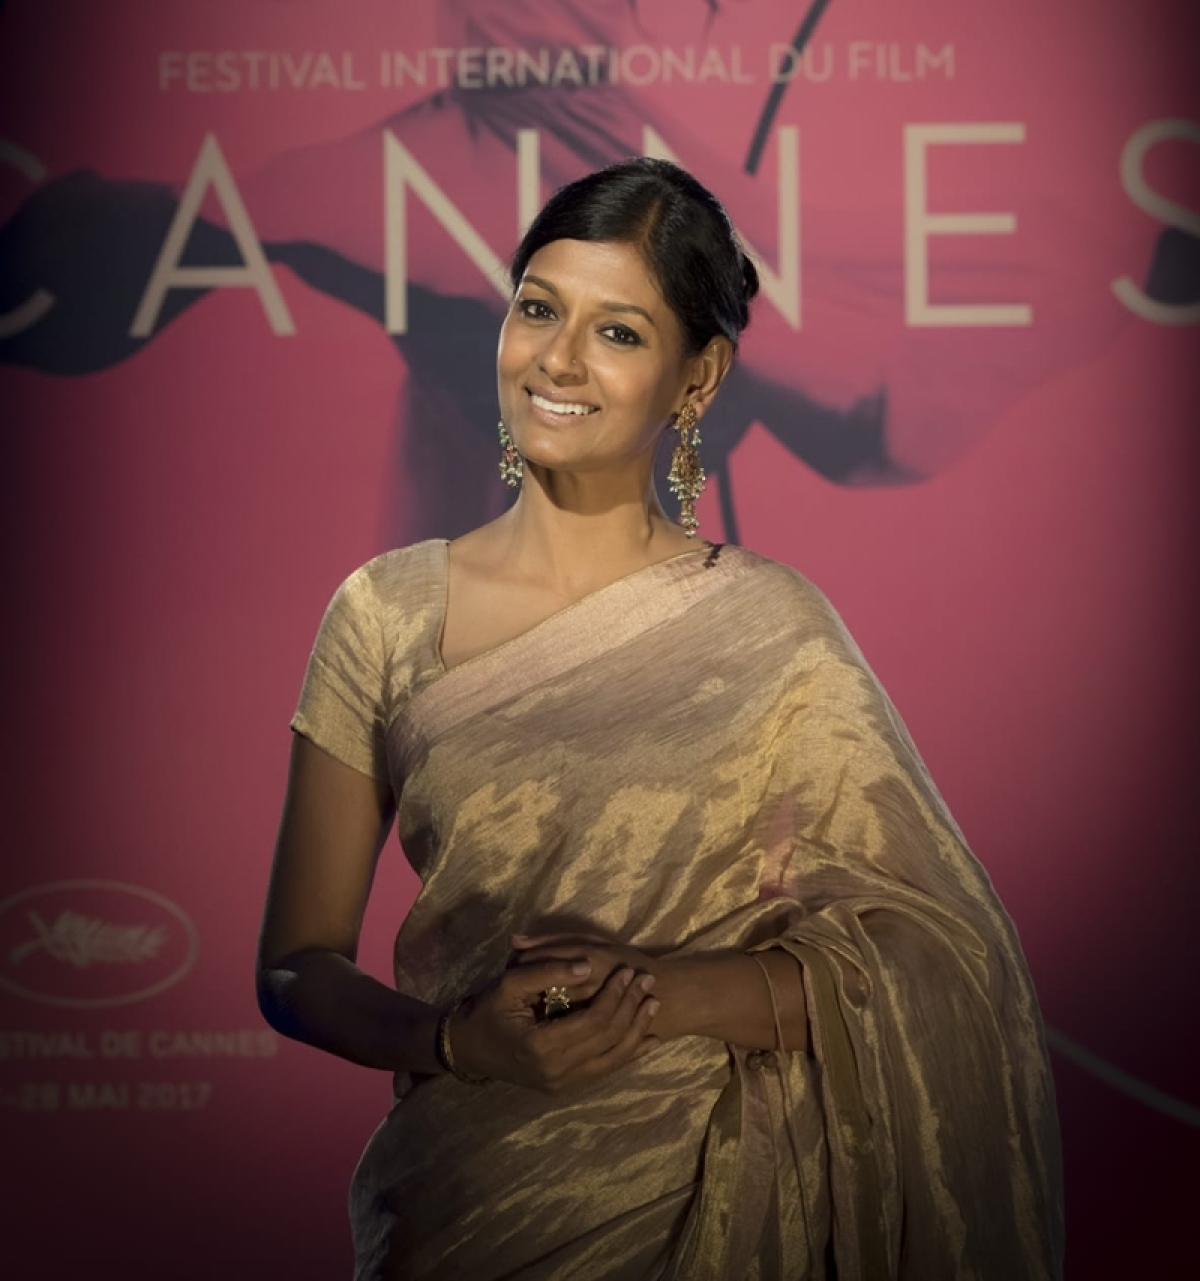 Nandita Das to speak at the prestigious 'Les Napoleons' in France